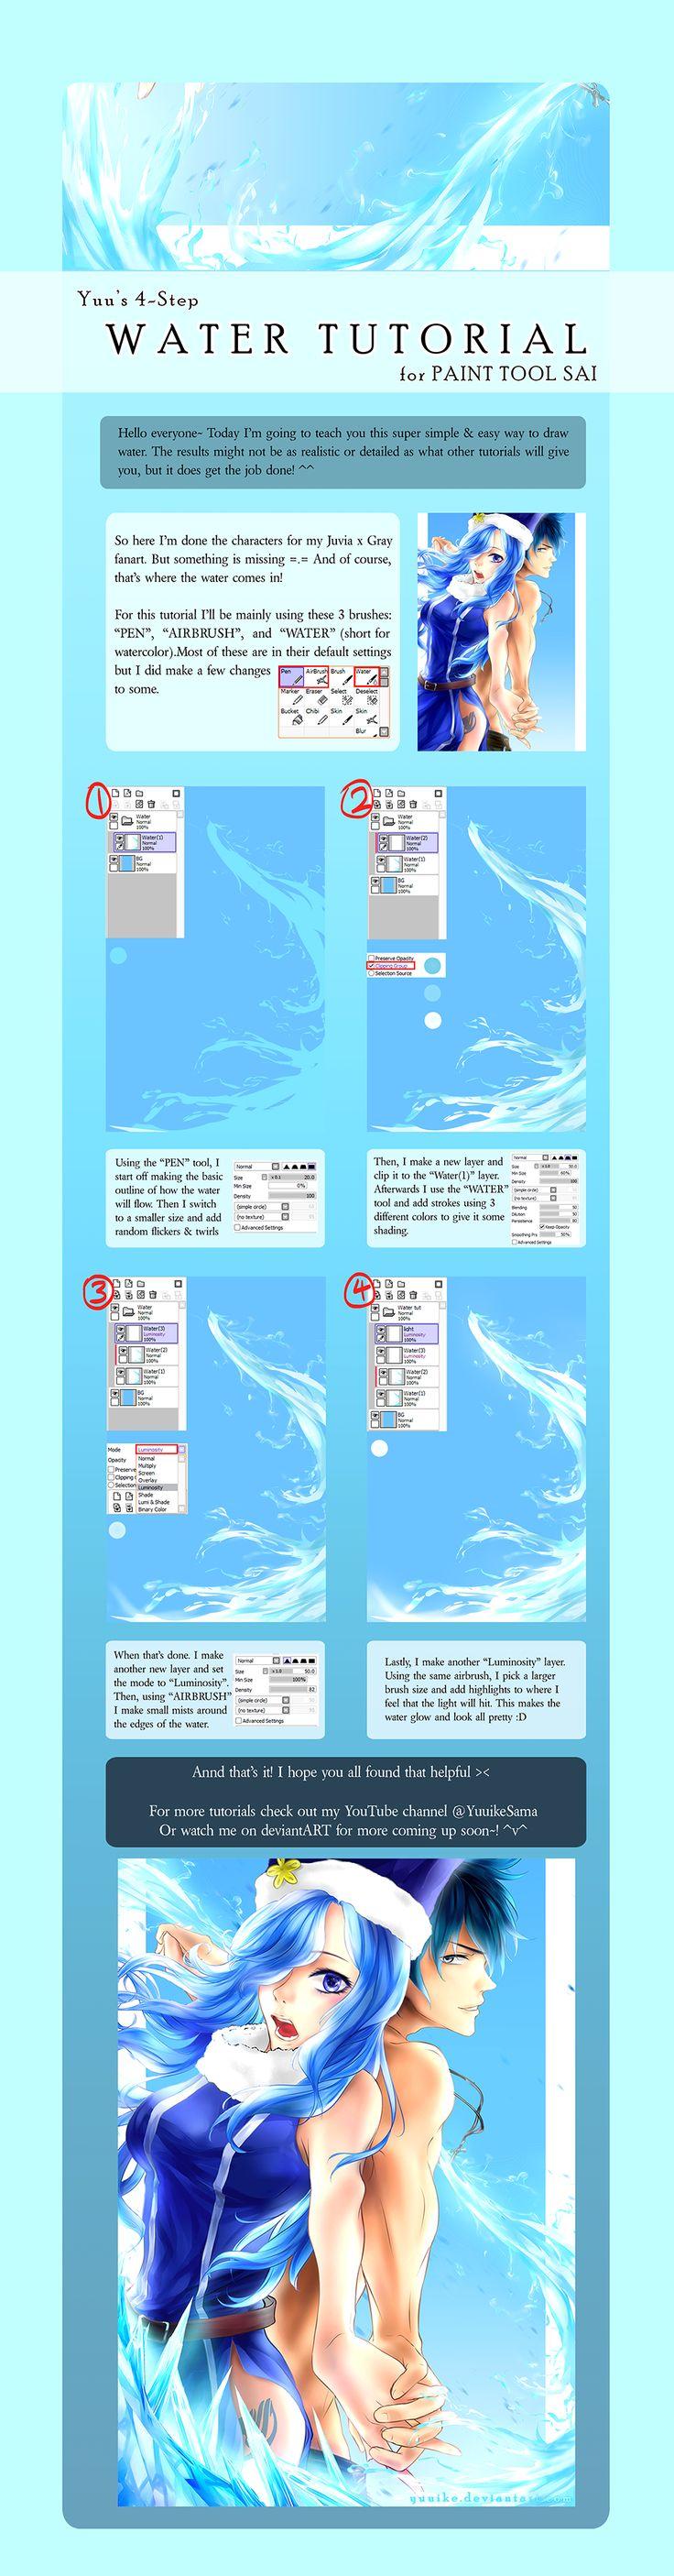 4-step Water Tutorial by yuuike.deviantart.com on @DeviantArt